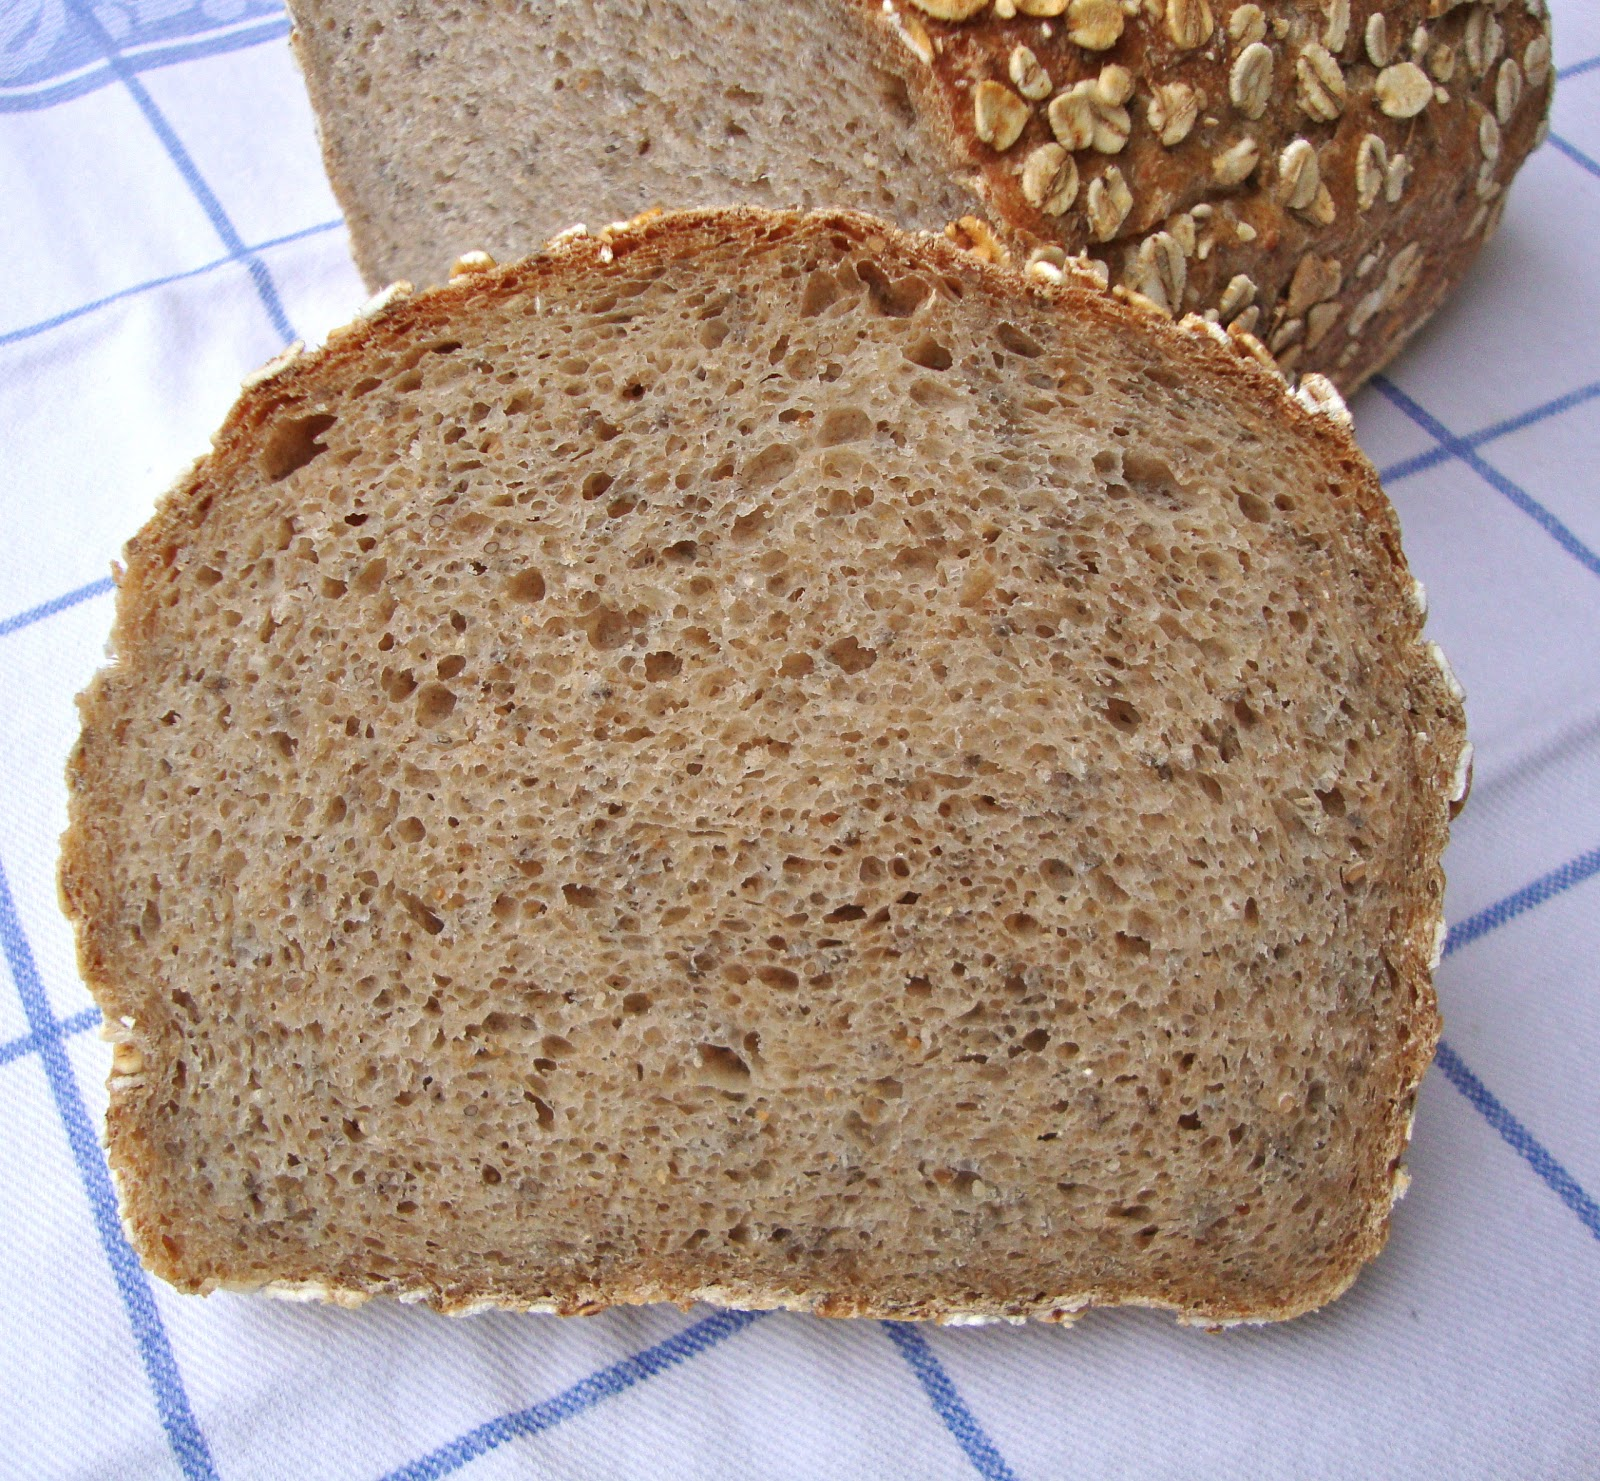 Cooketteria Saftiges 20 Korn Brot mit Chia und Amaranth